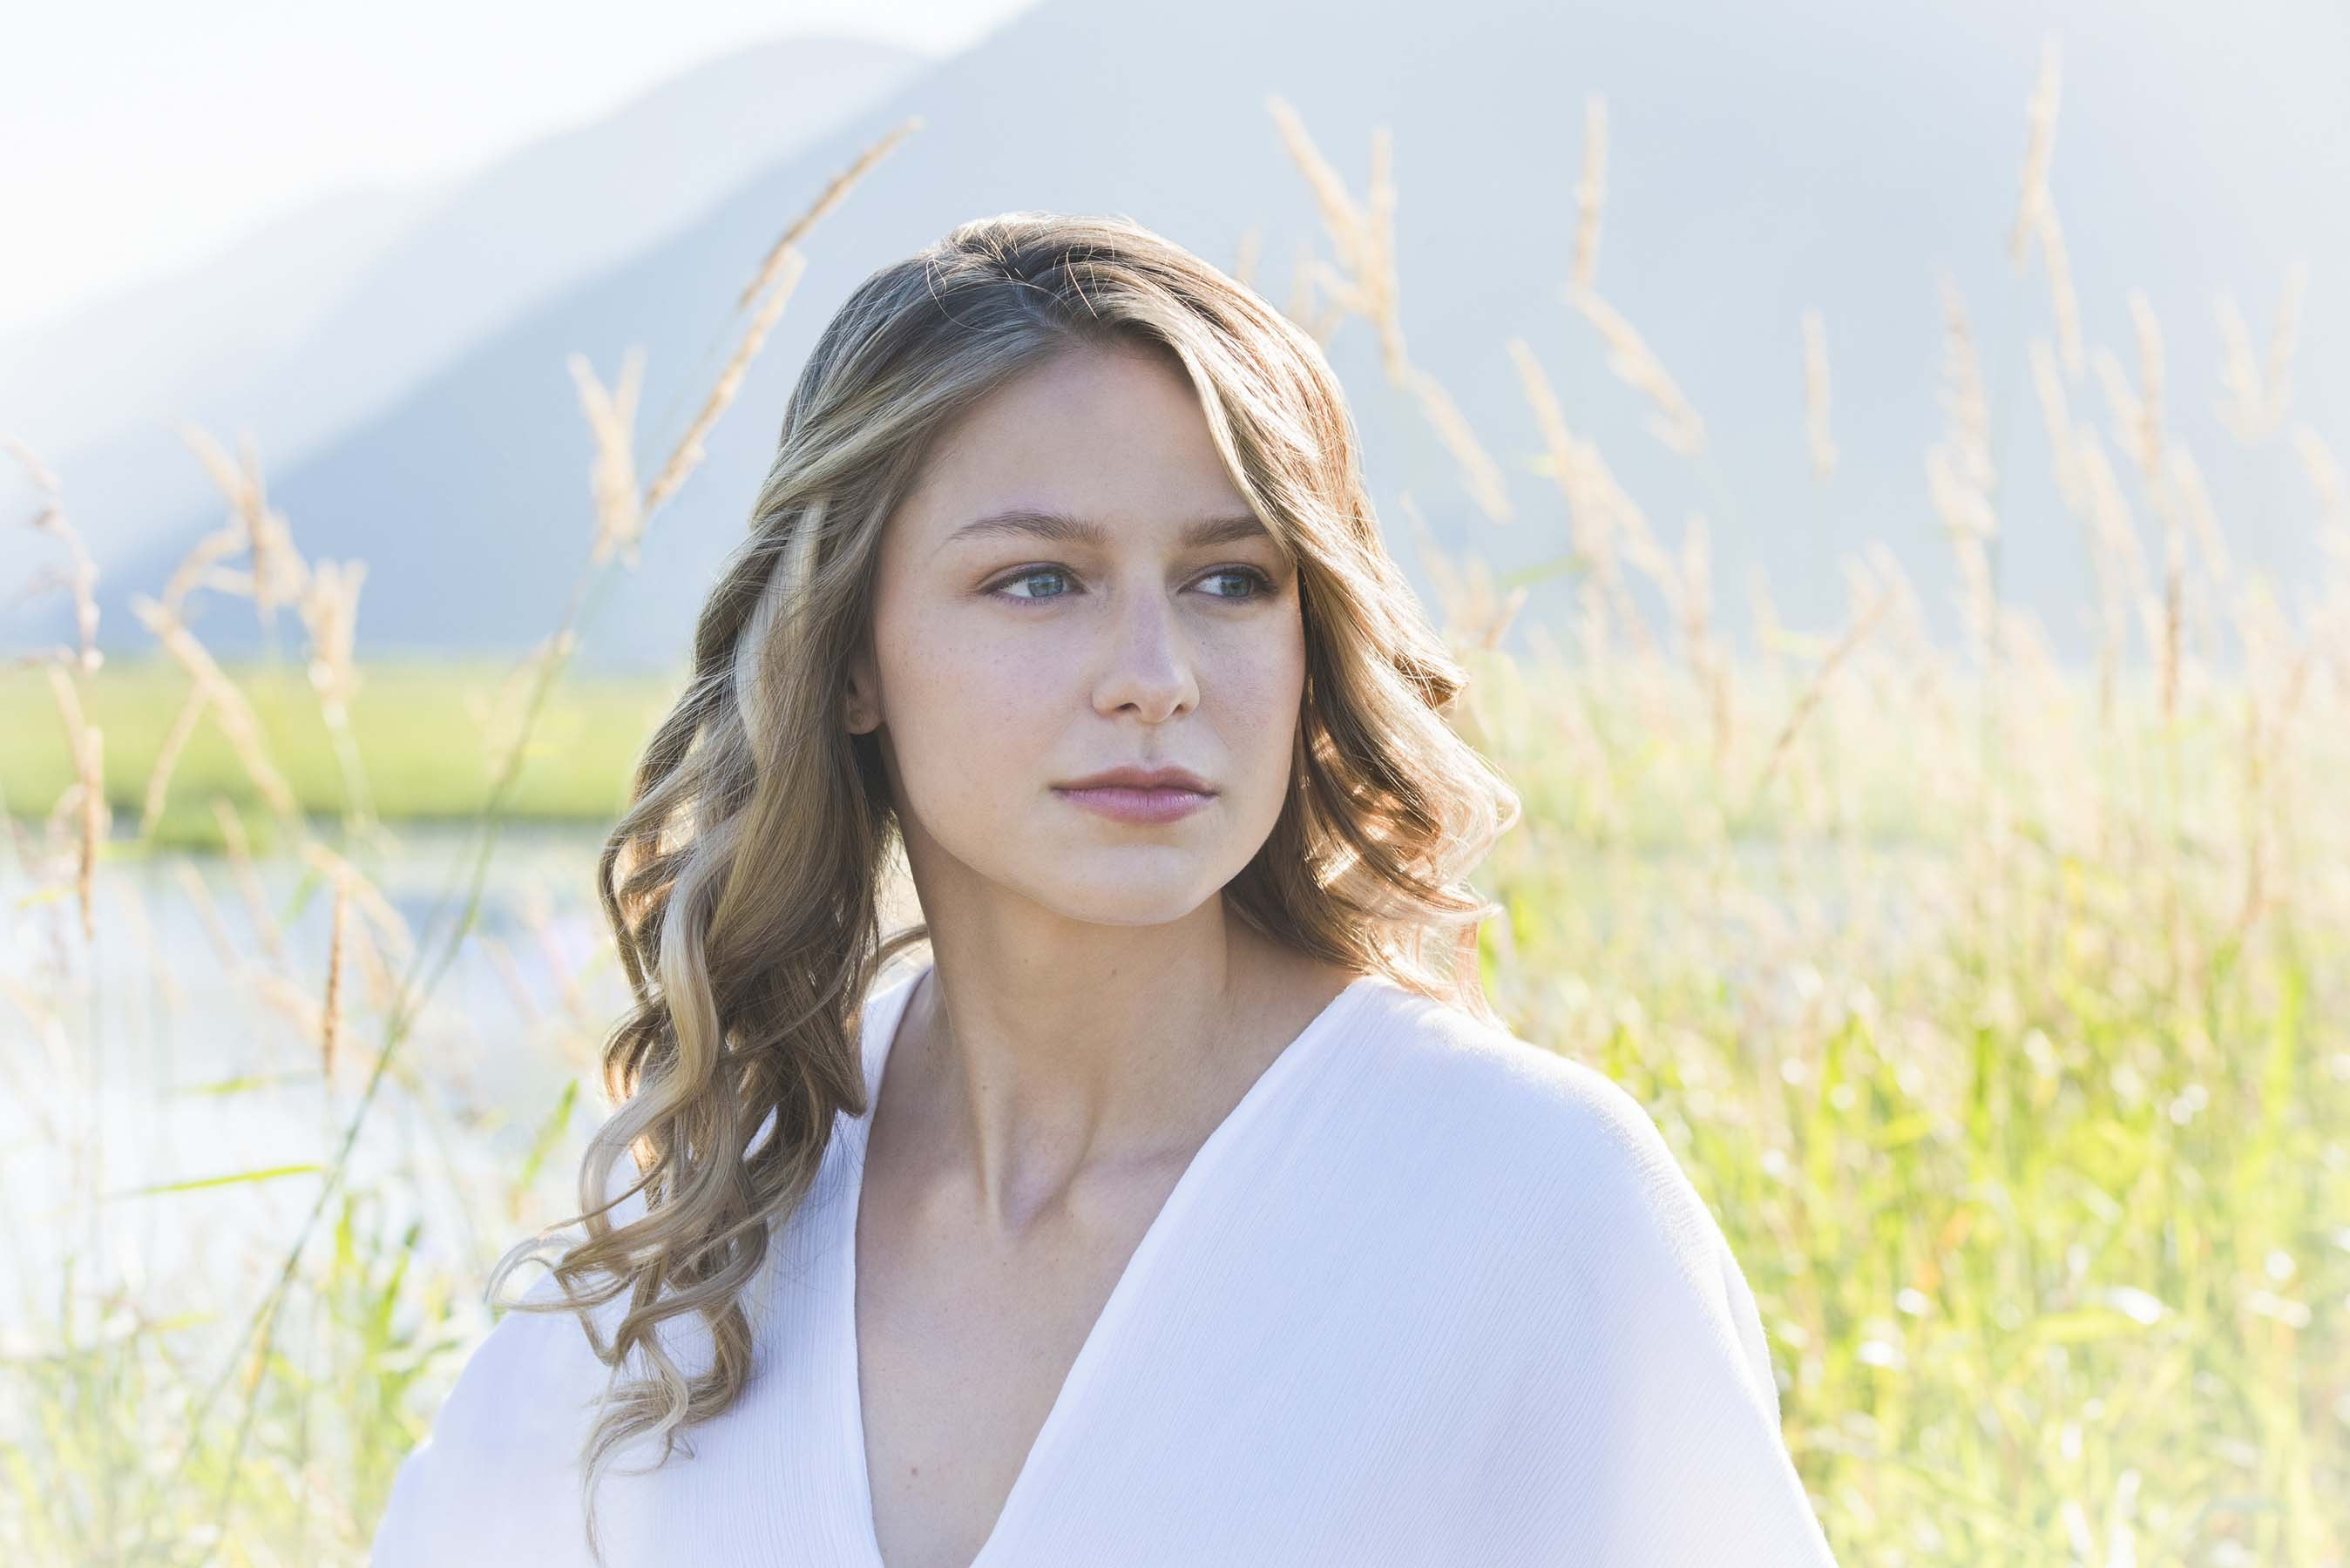 Melissa Benoist Cute 2017, Full HD 2K Wallpaper